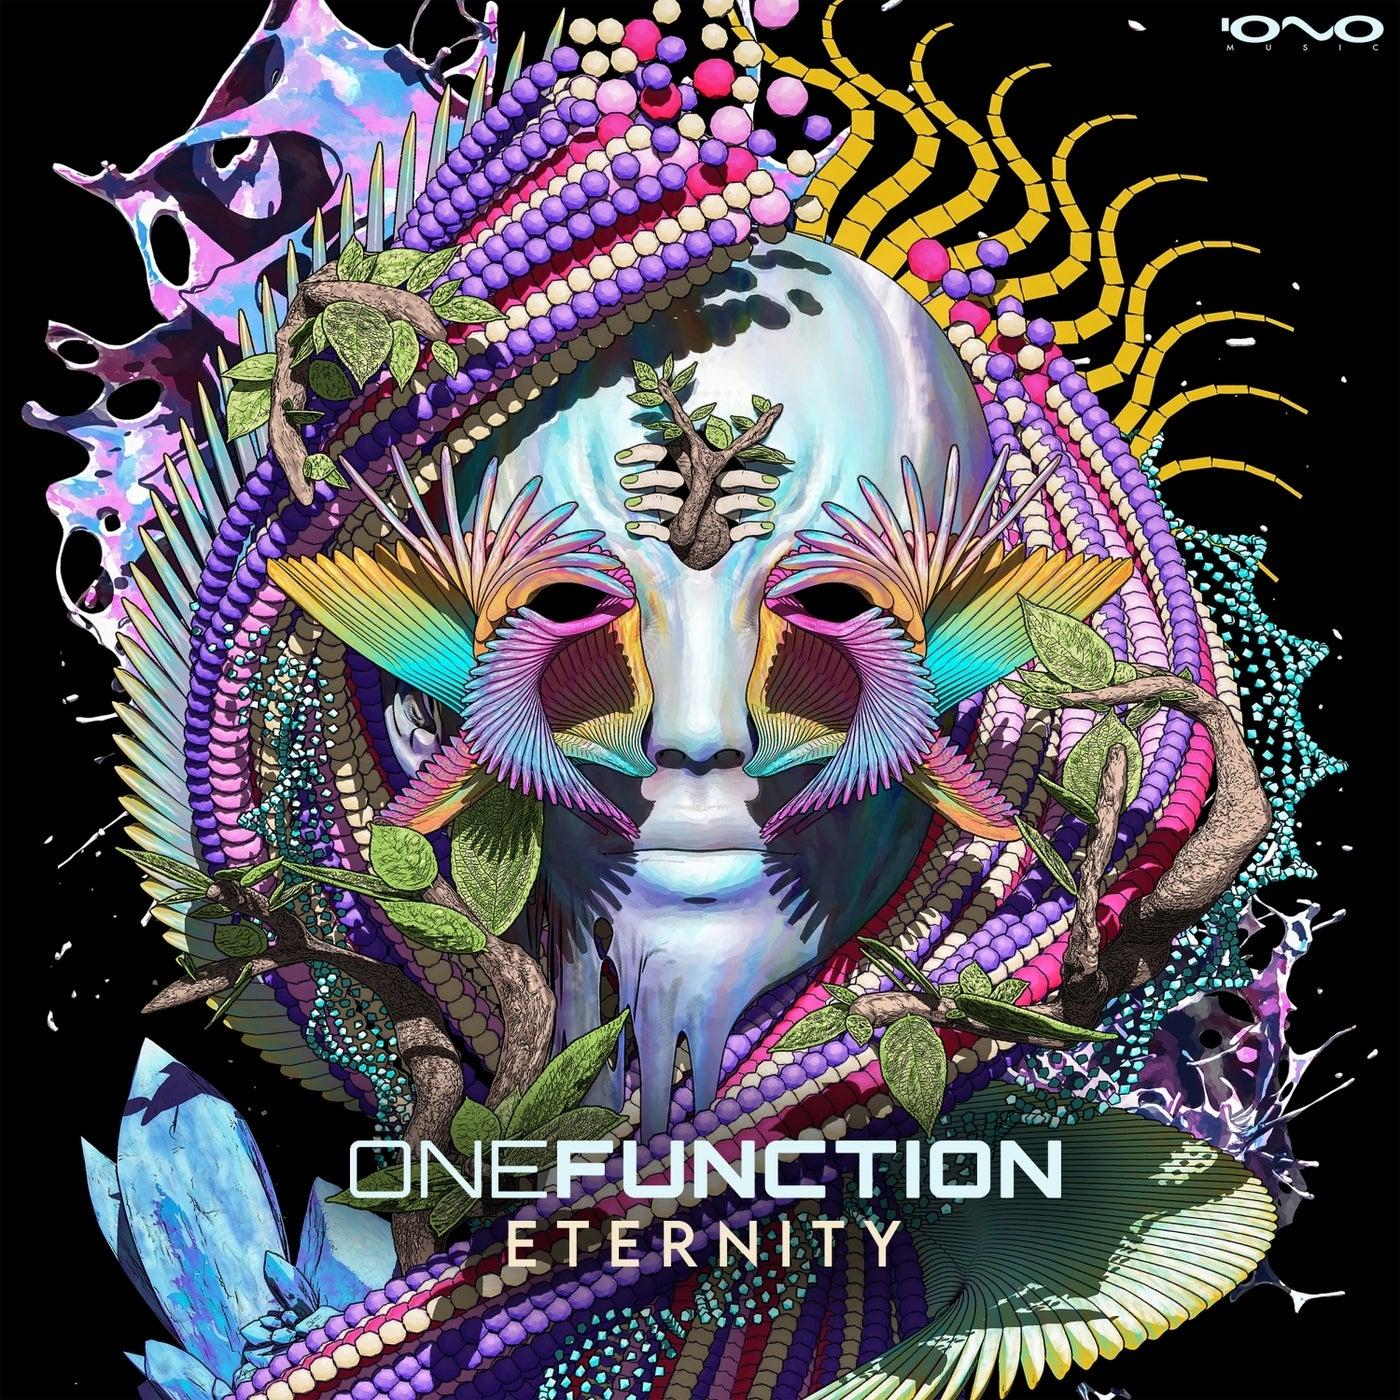 Eternity (Original Mix)